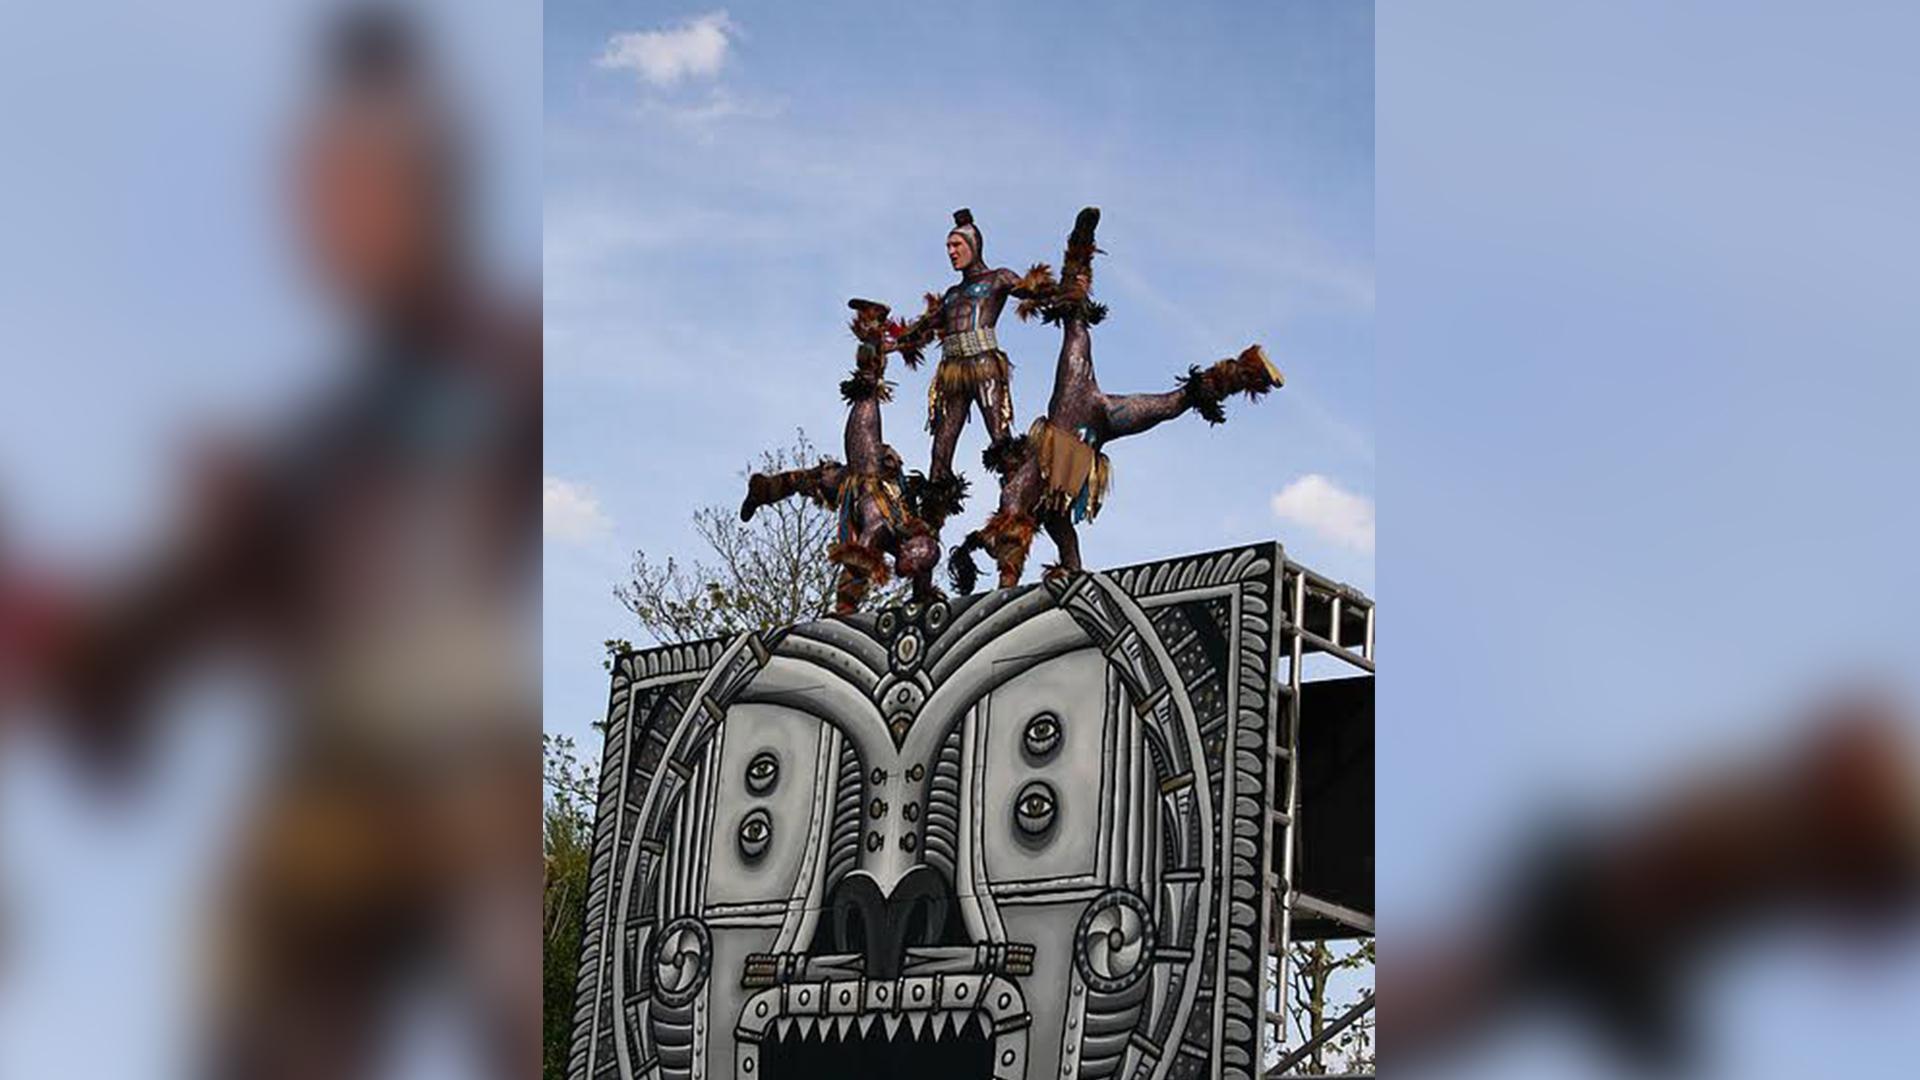 CirqulationLocale comedyArts Festival Moers